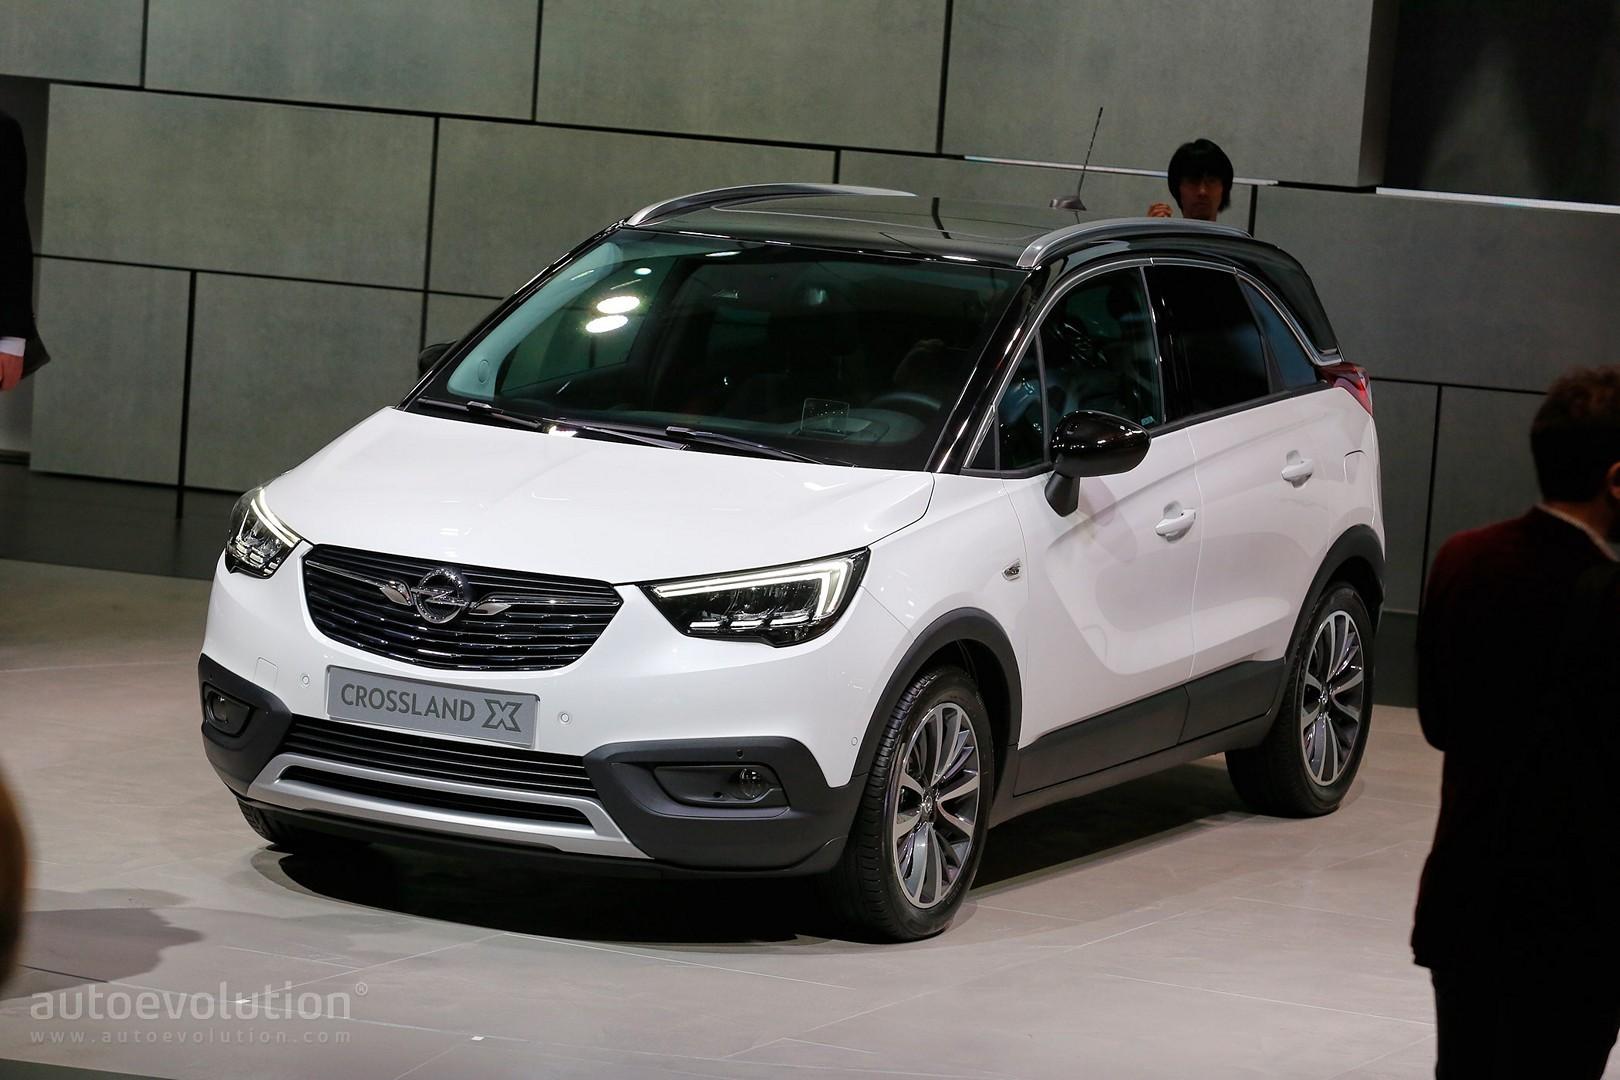 Opel Crossland X Is Now A Peugeot In Geneva Autoevolution